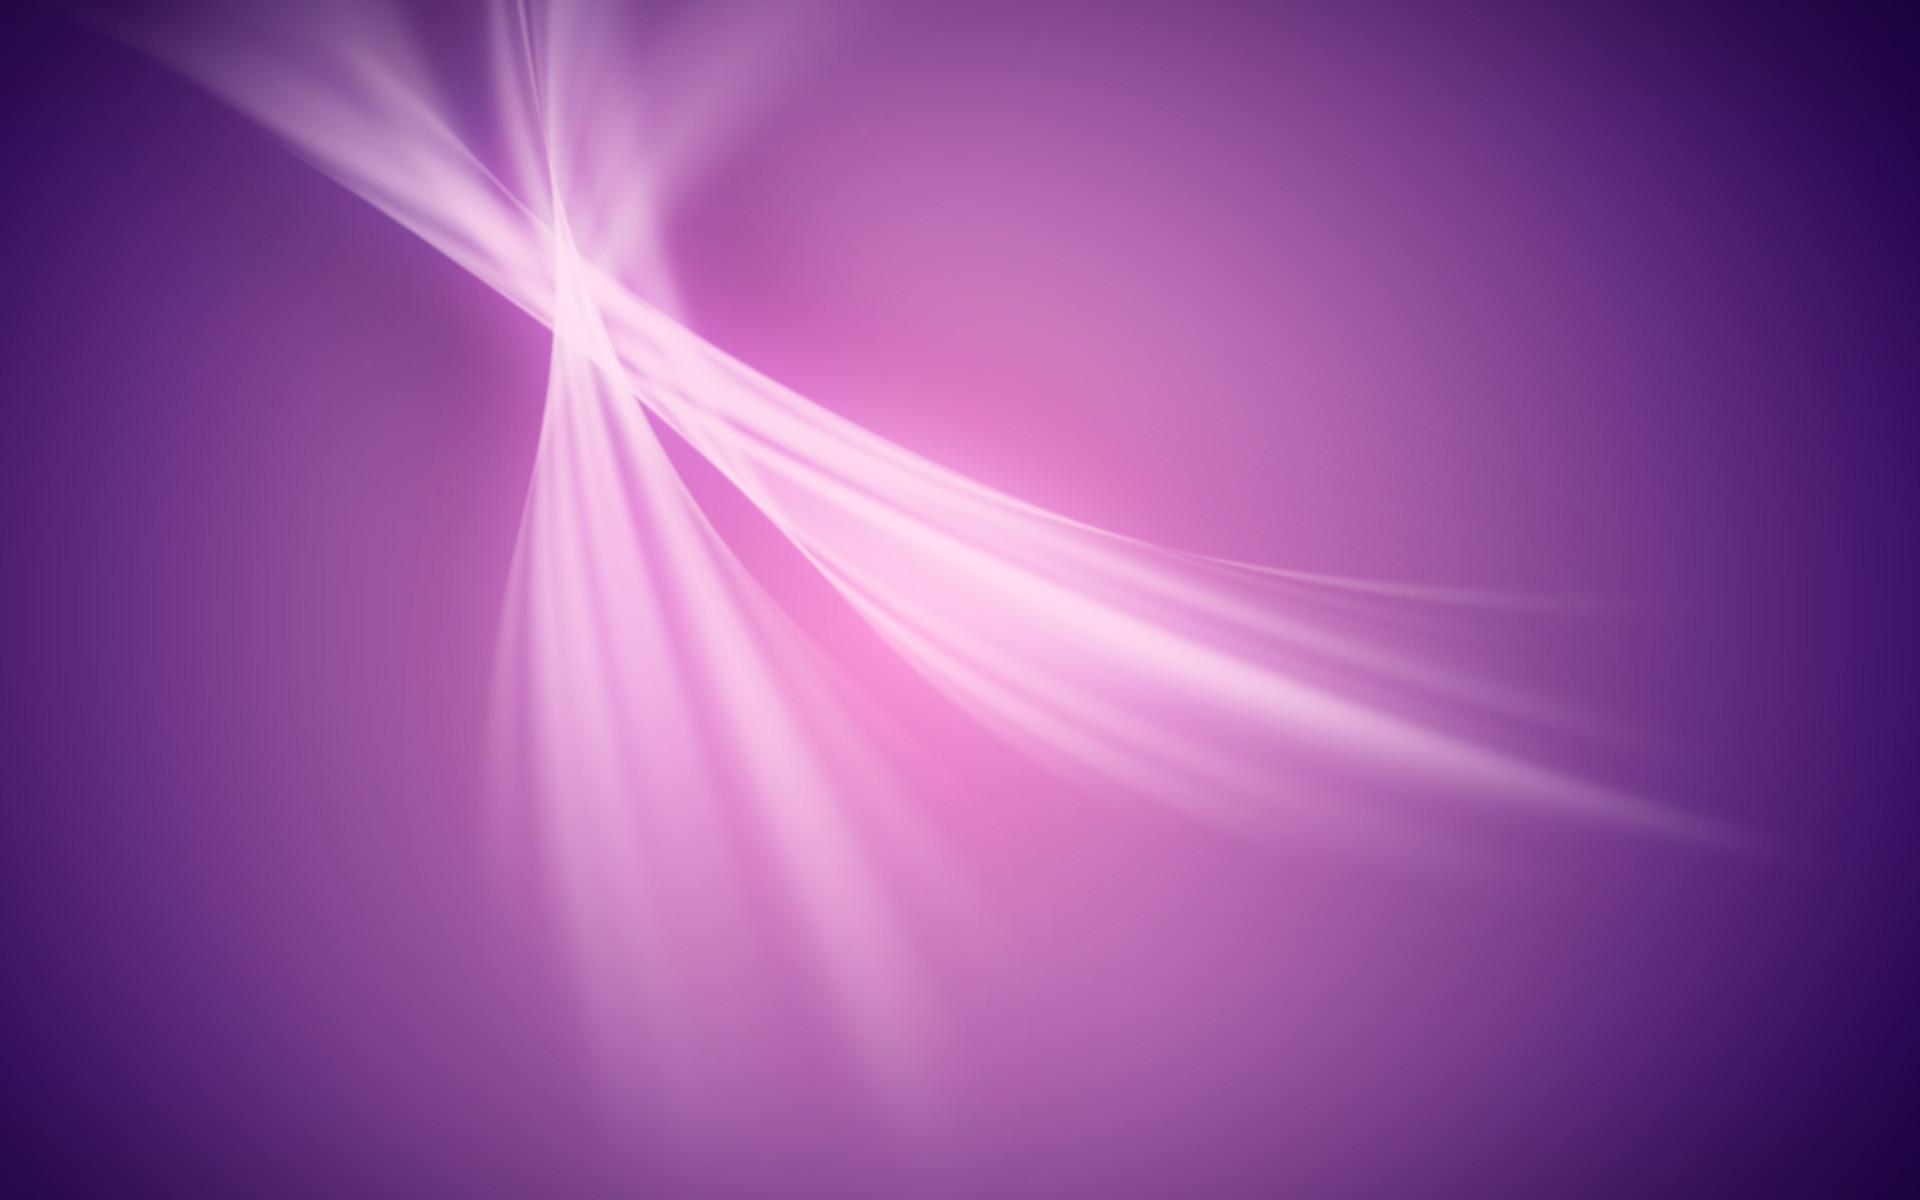 1920x1200, Light Violet Color Wallpaper   Data Id 101659 - Purple Wallpaper Hd Iphone 7 New - HD Wallpaper